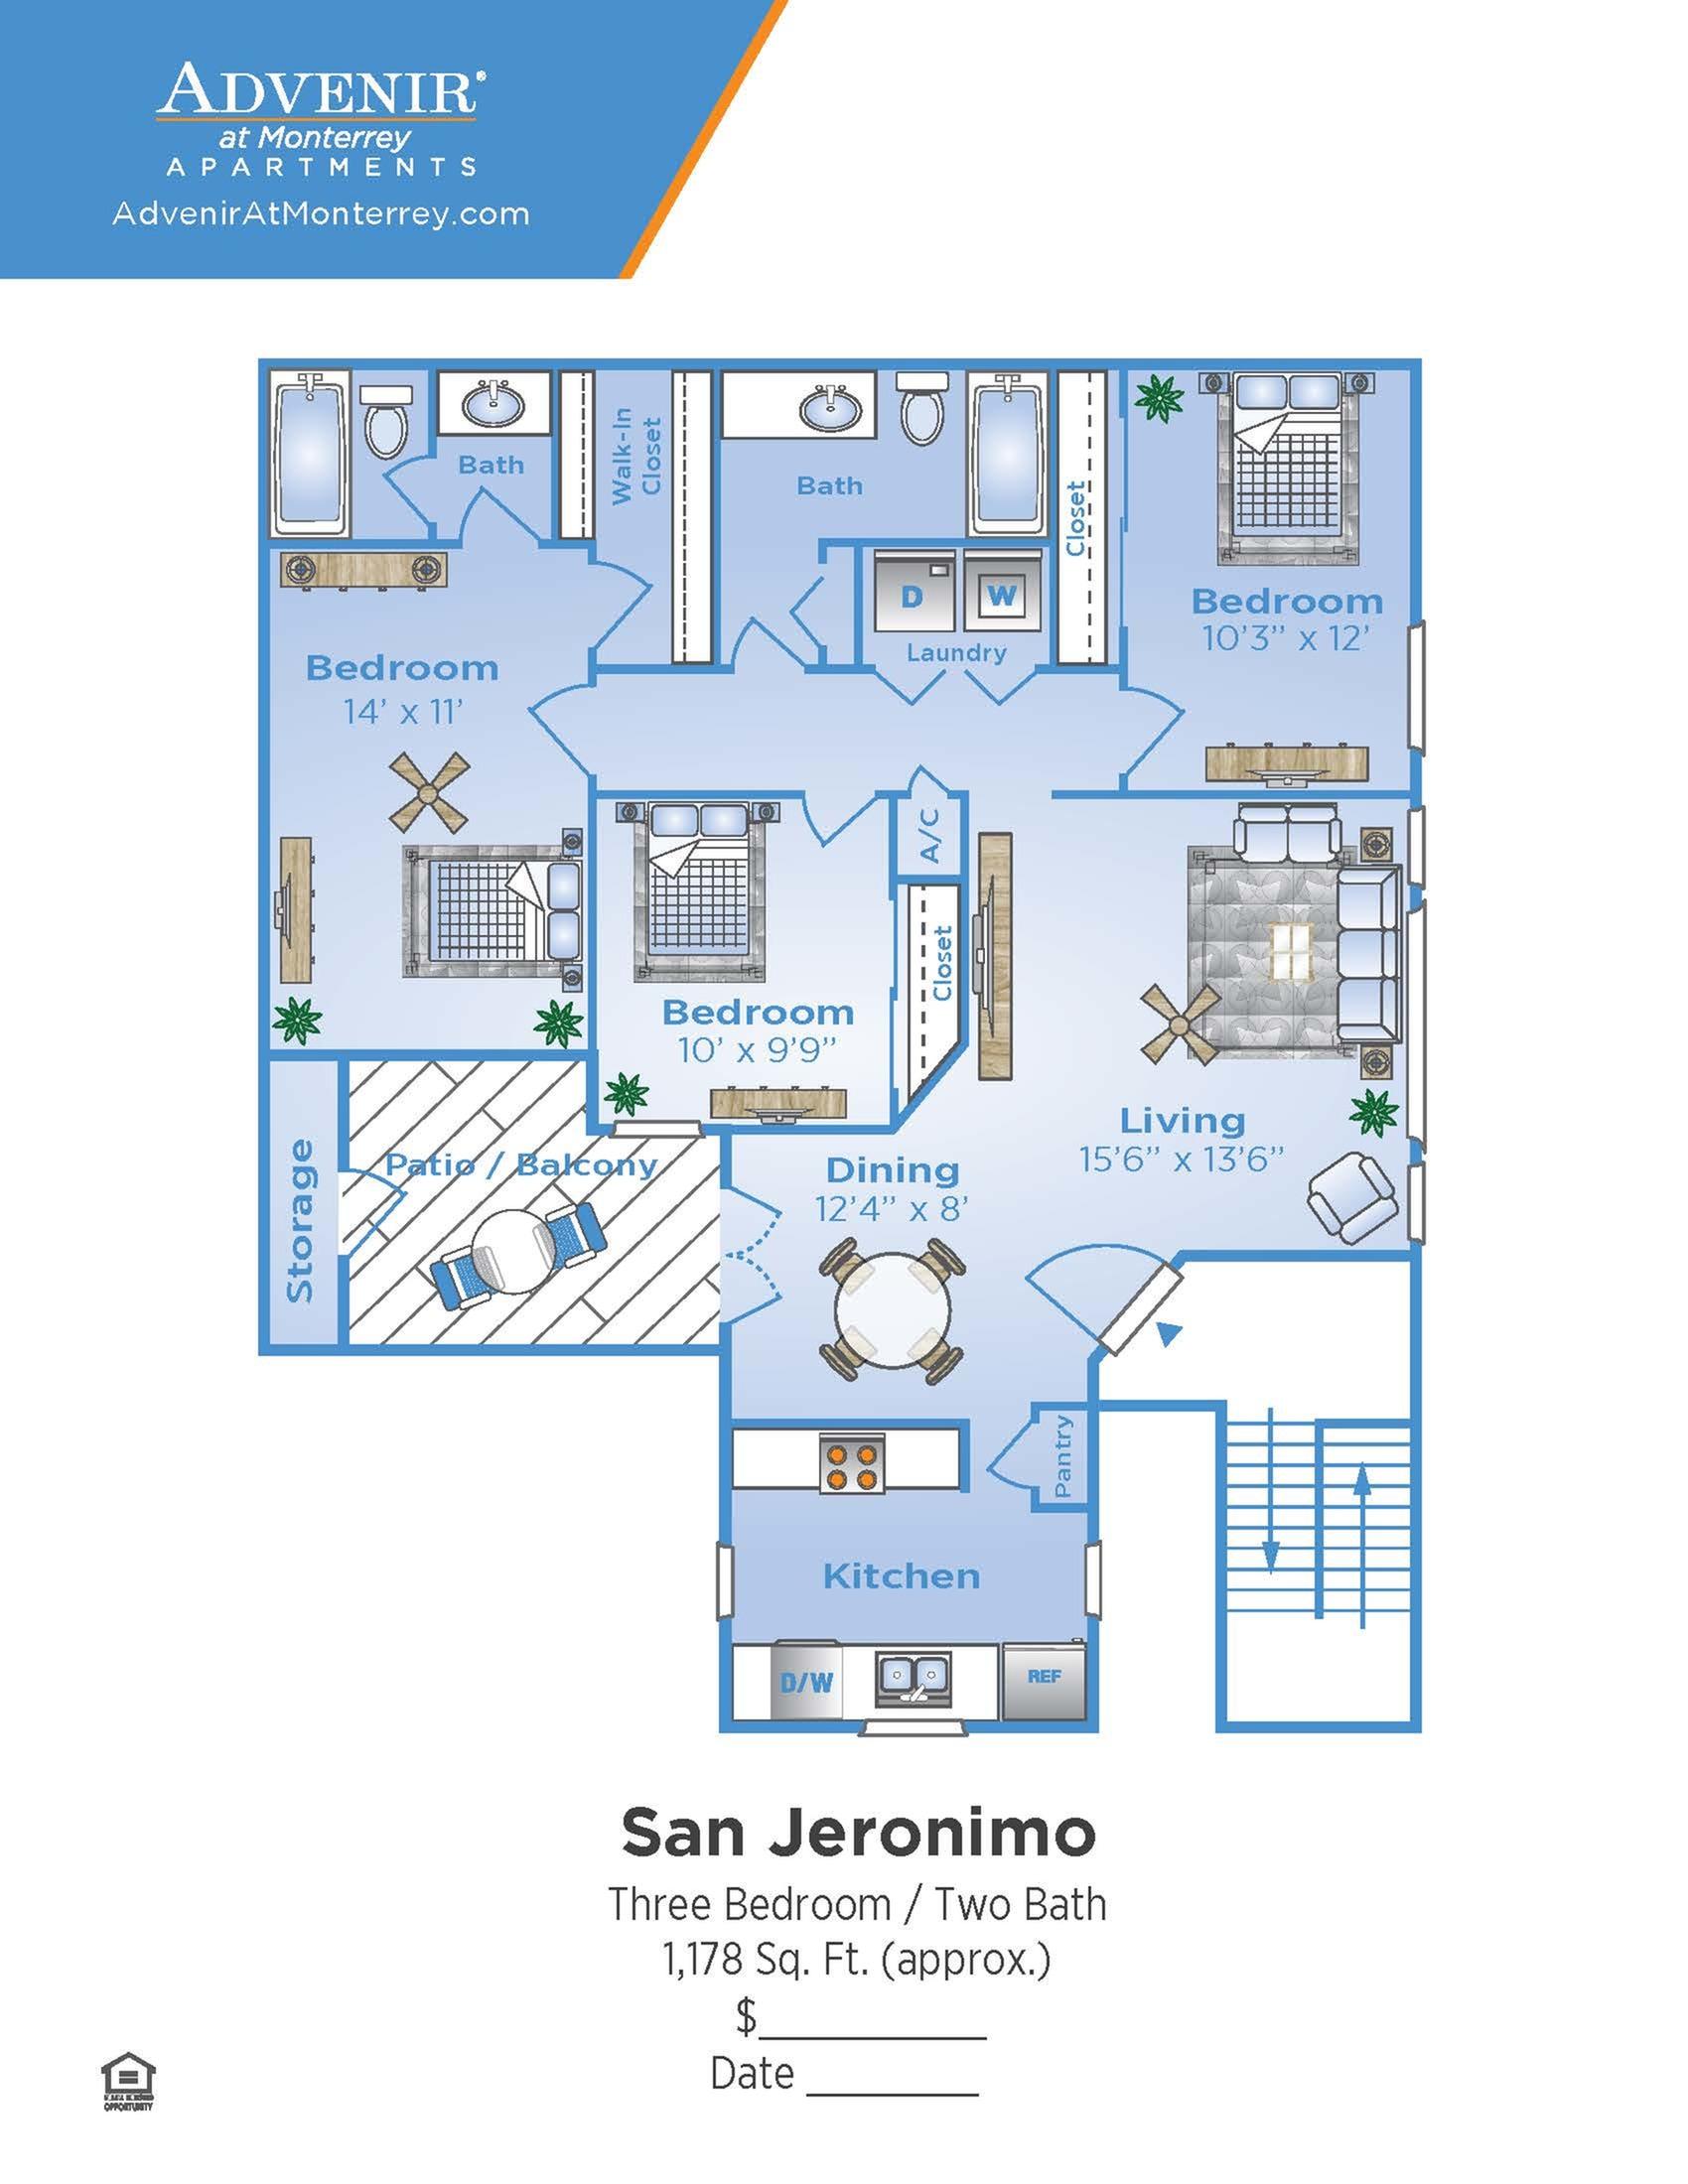 3 Bedroom Floor Plan | Apartments In Venice Florida | Advenir at Monterrey